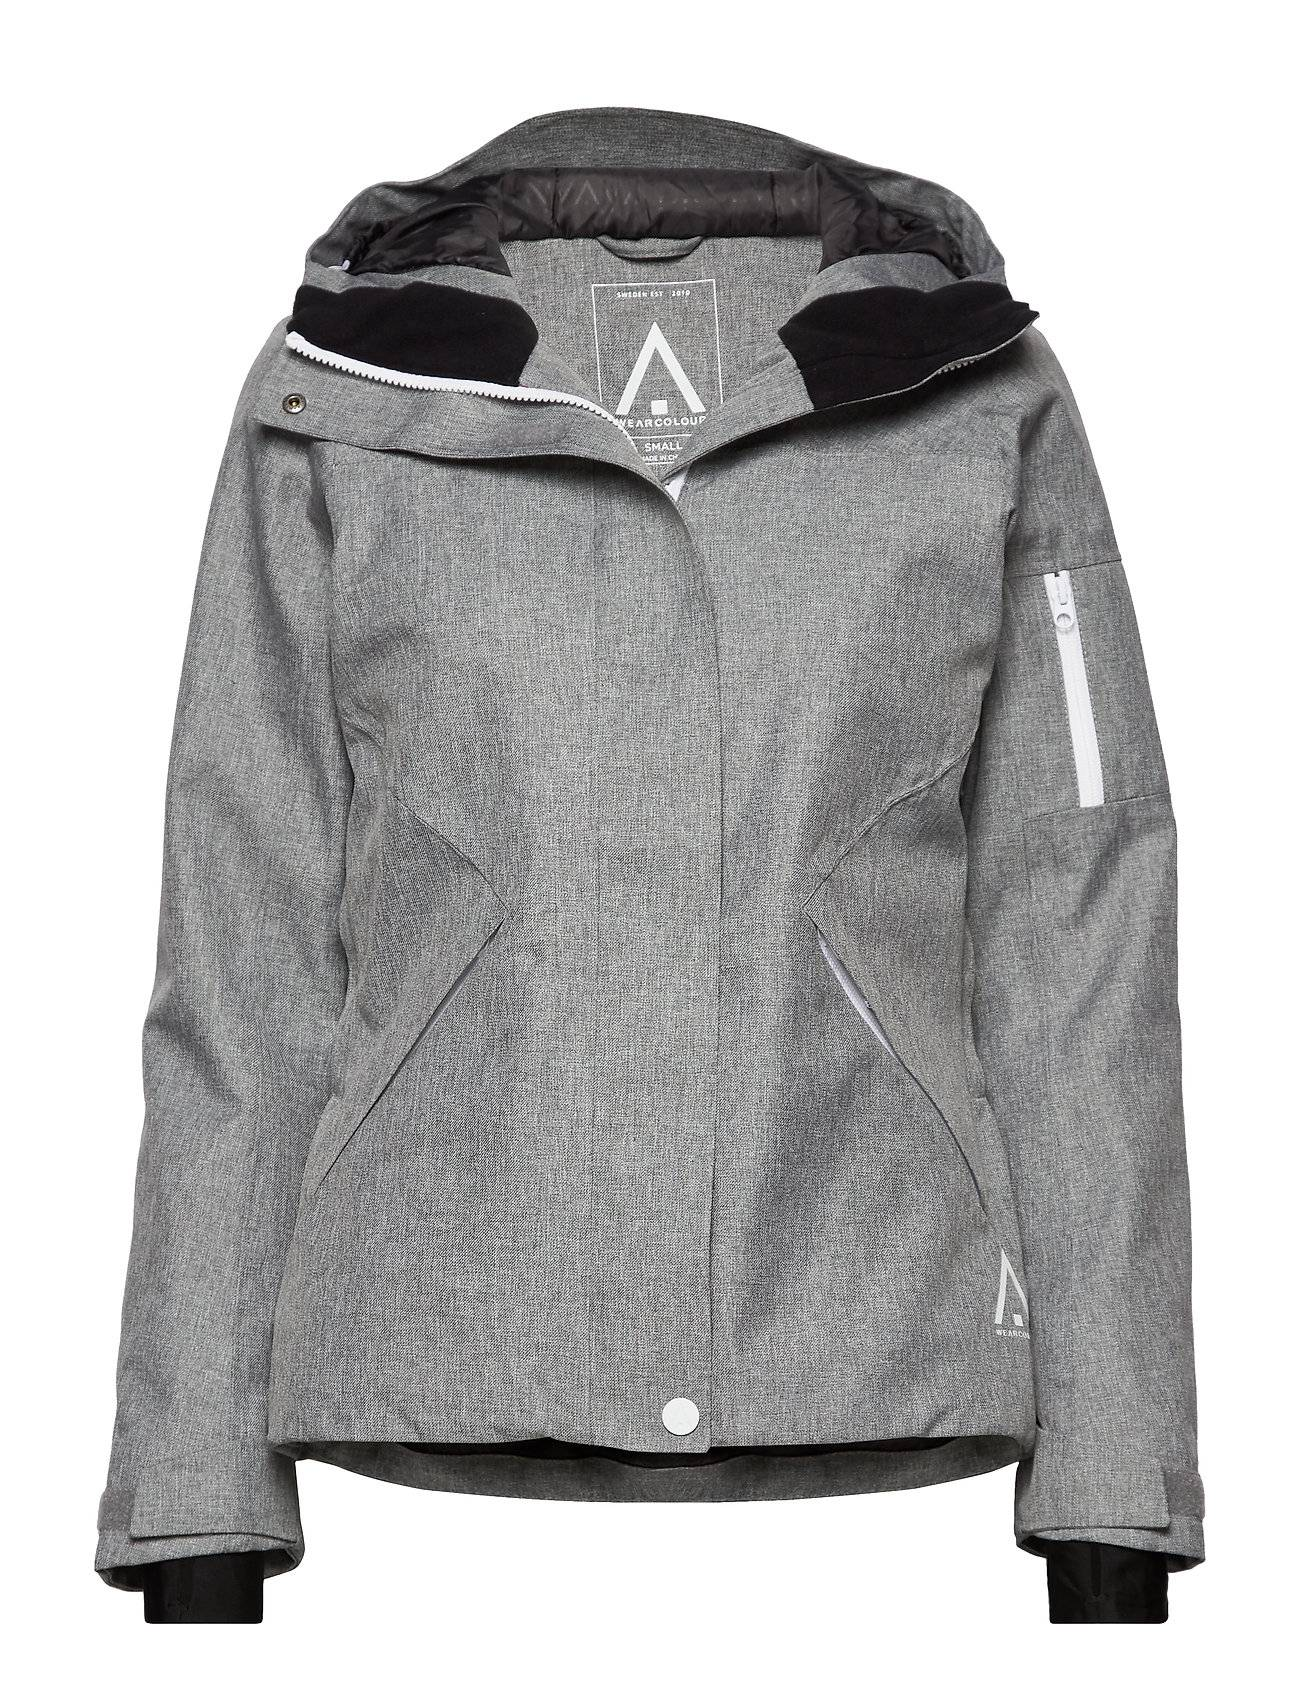 WearColour Base Jacket Outerwear Sport Jackets Harmaa WearColour